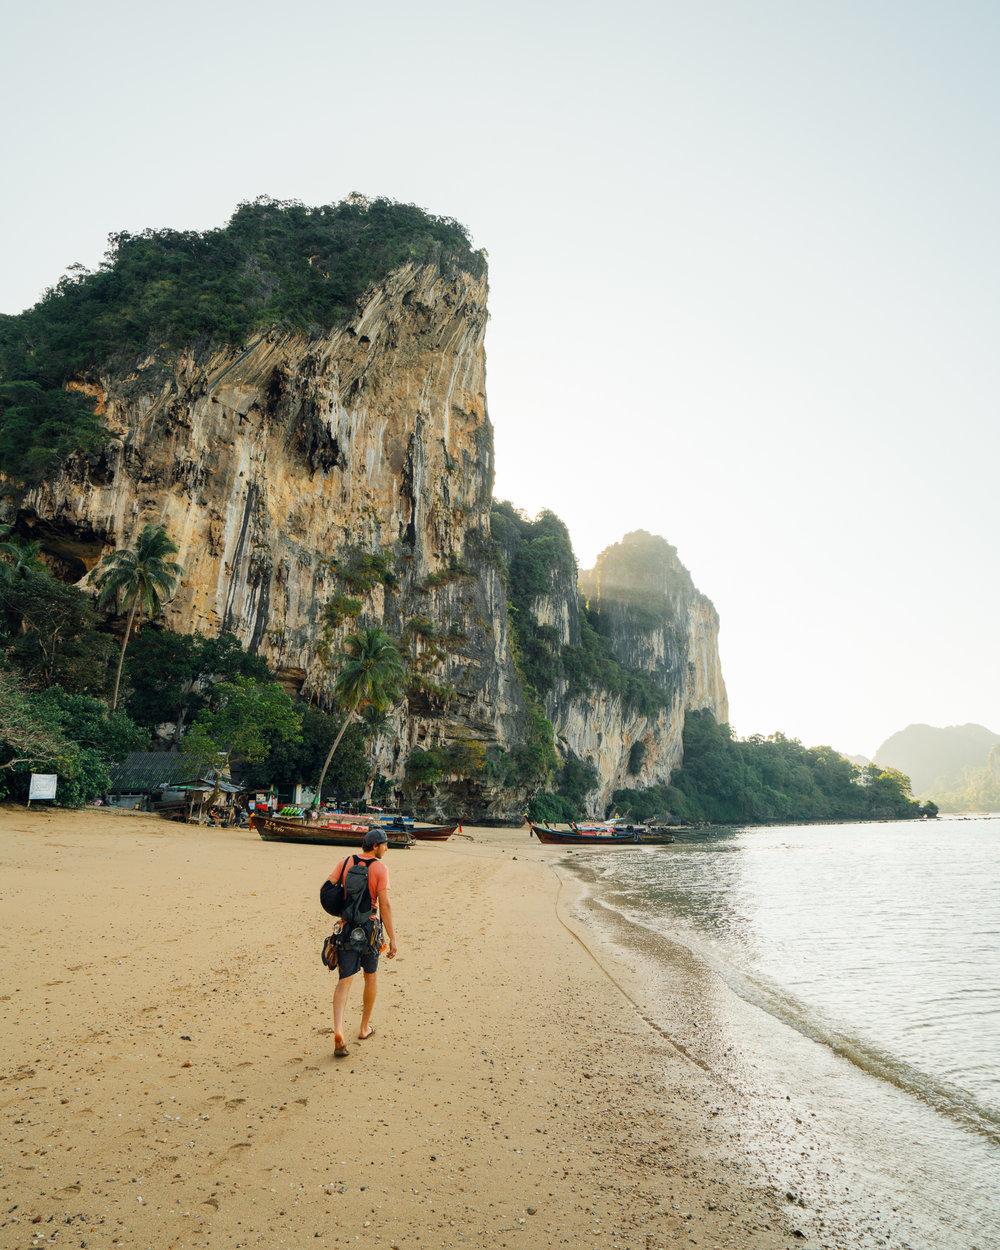 LM_thailand-00936.jpg